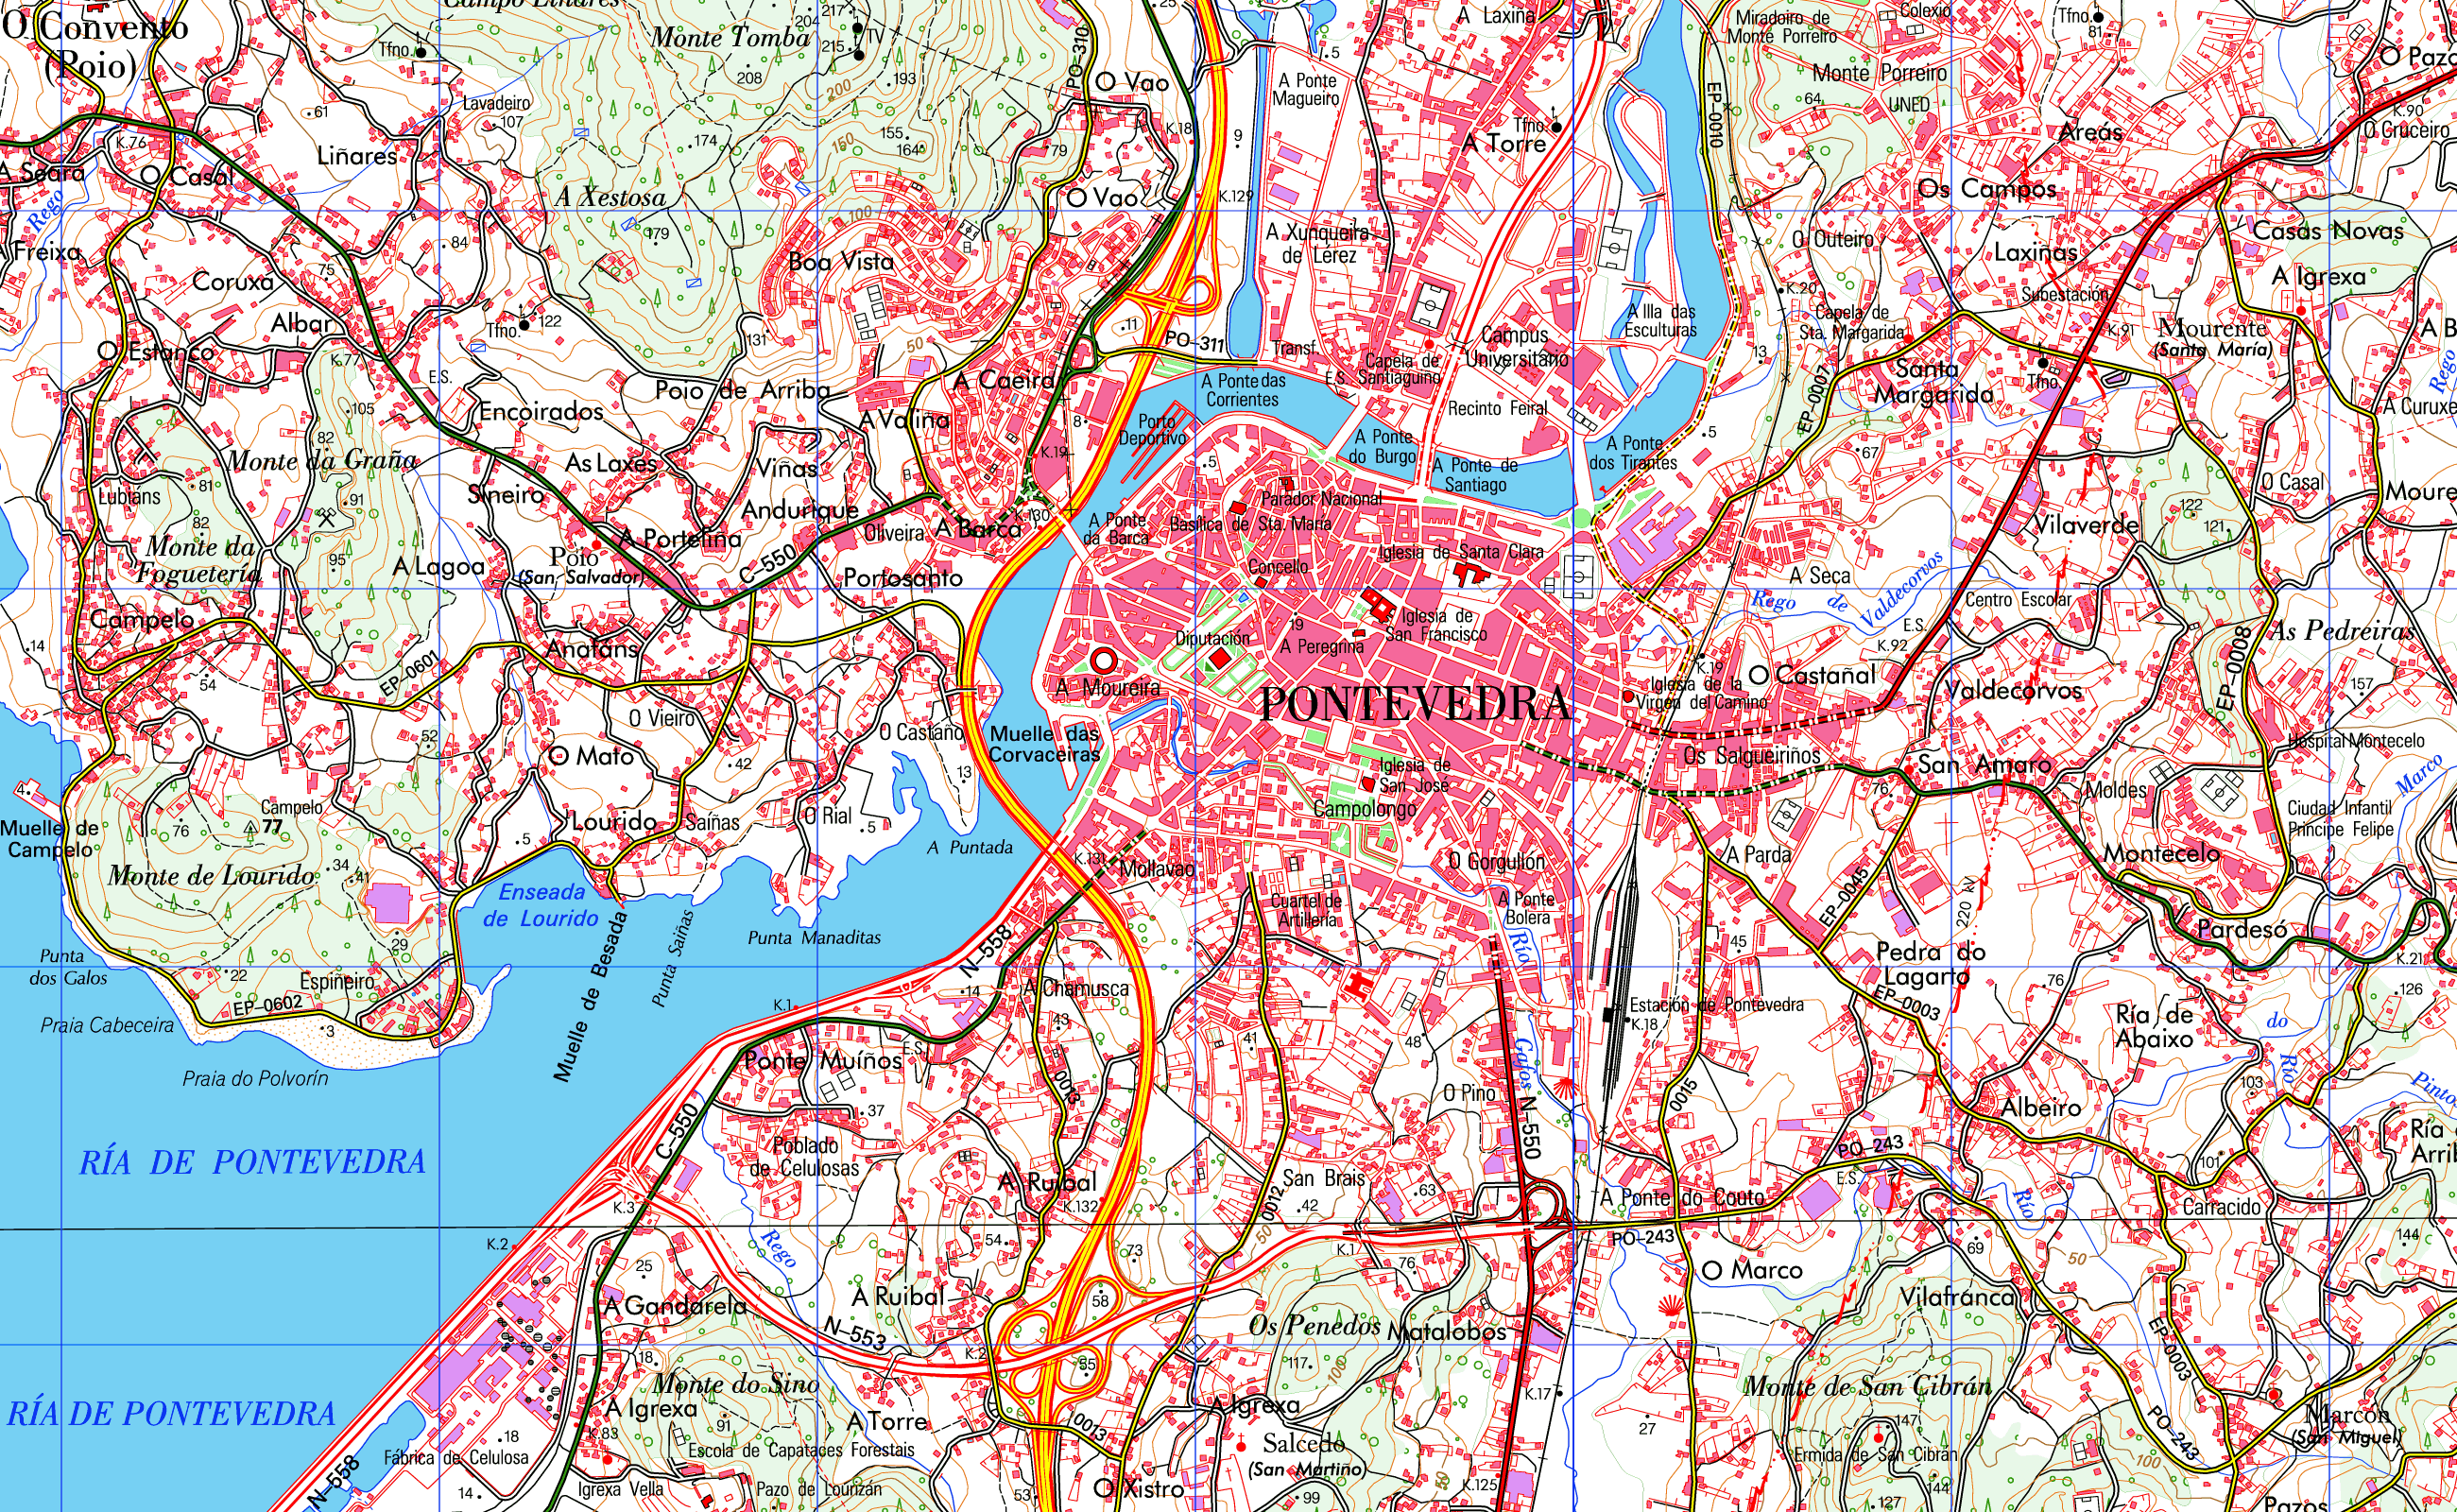 Pontevedra map